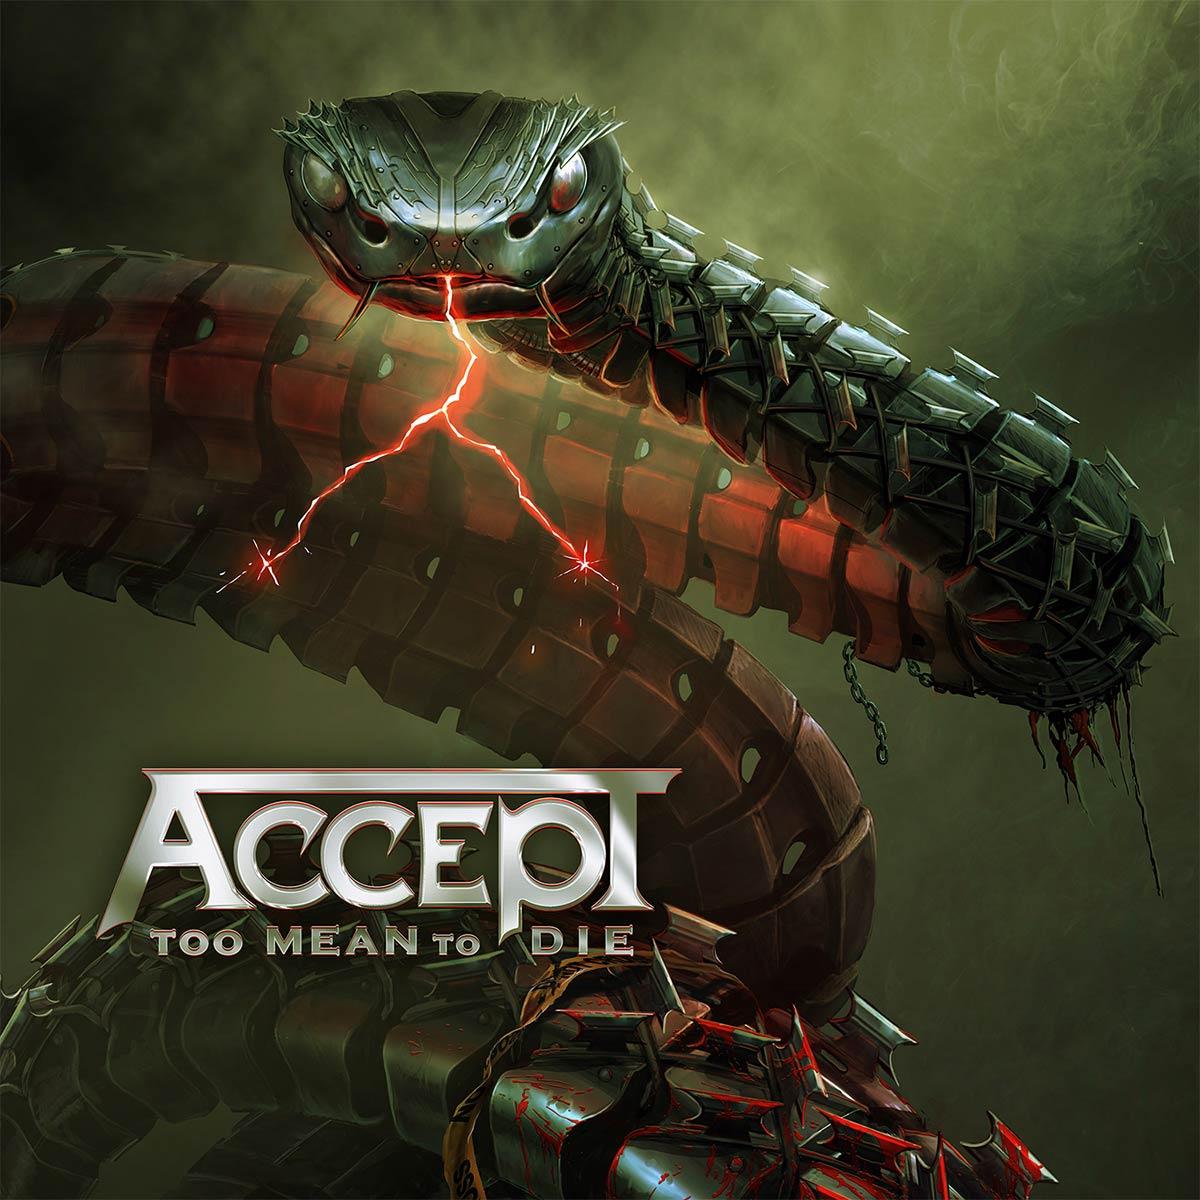 ACCEPT - Página 2 Accept-too-mean-to-die